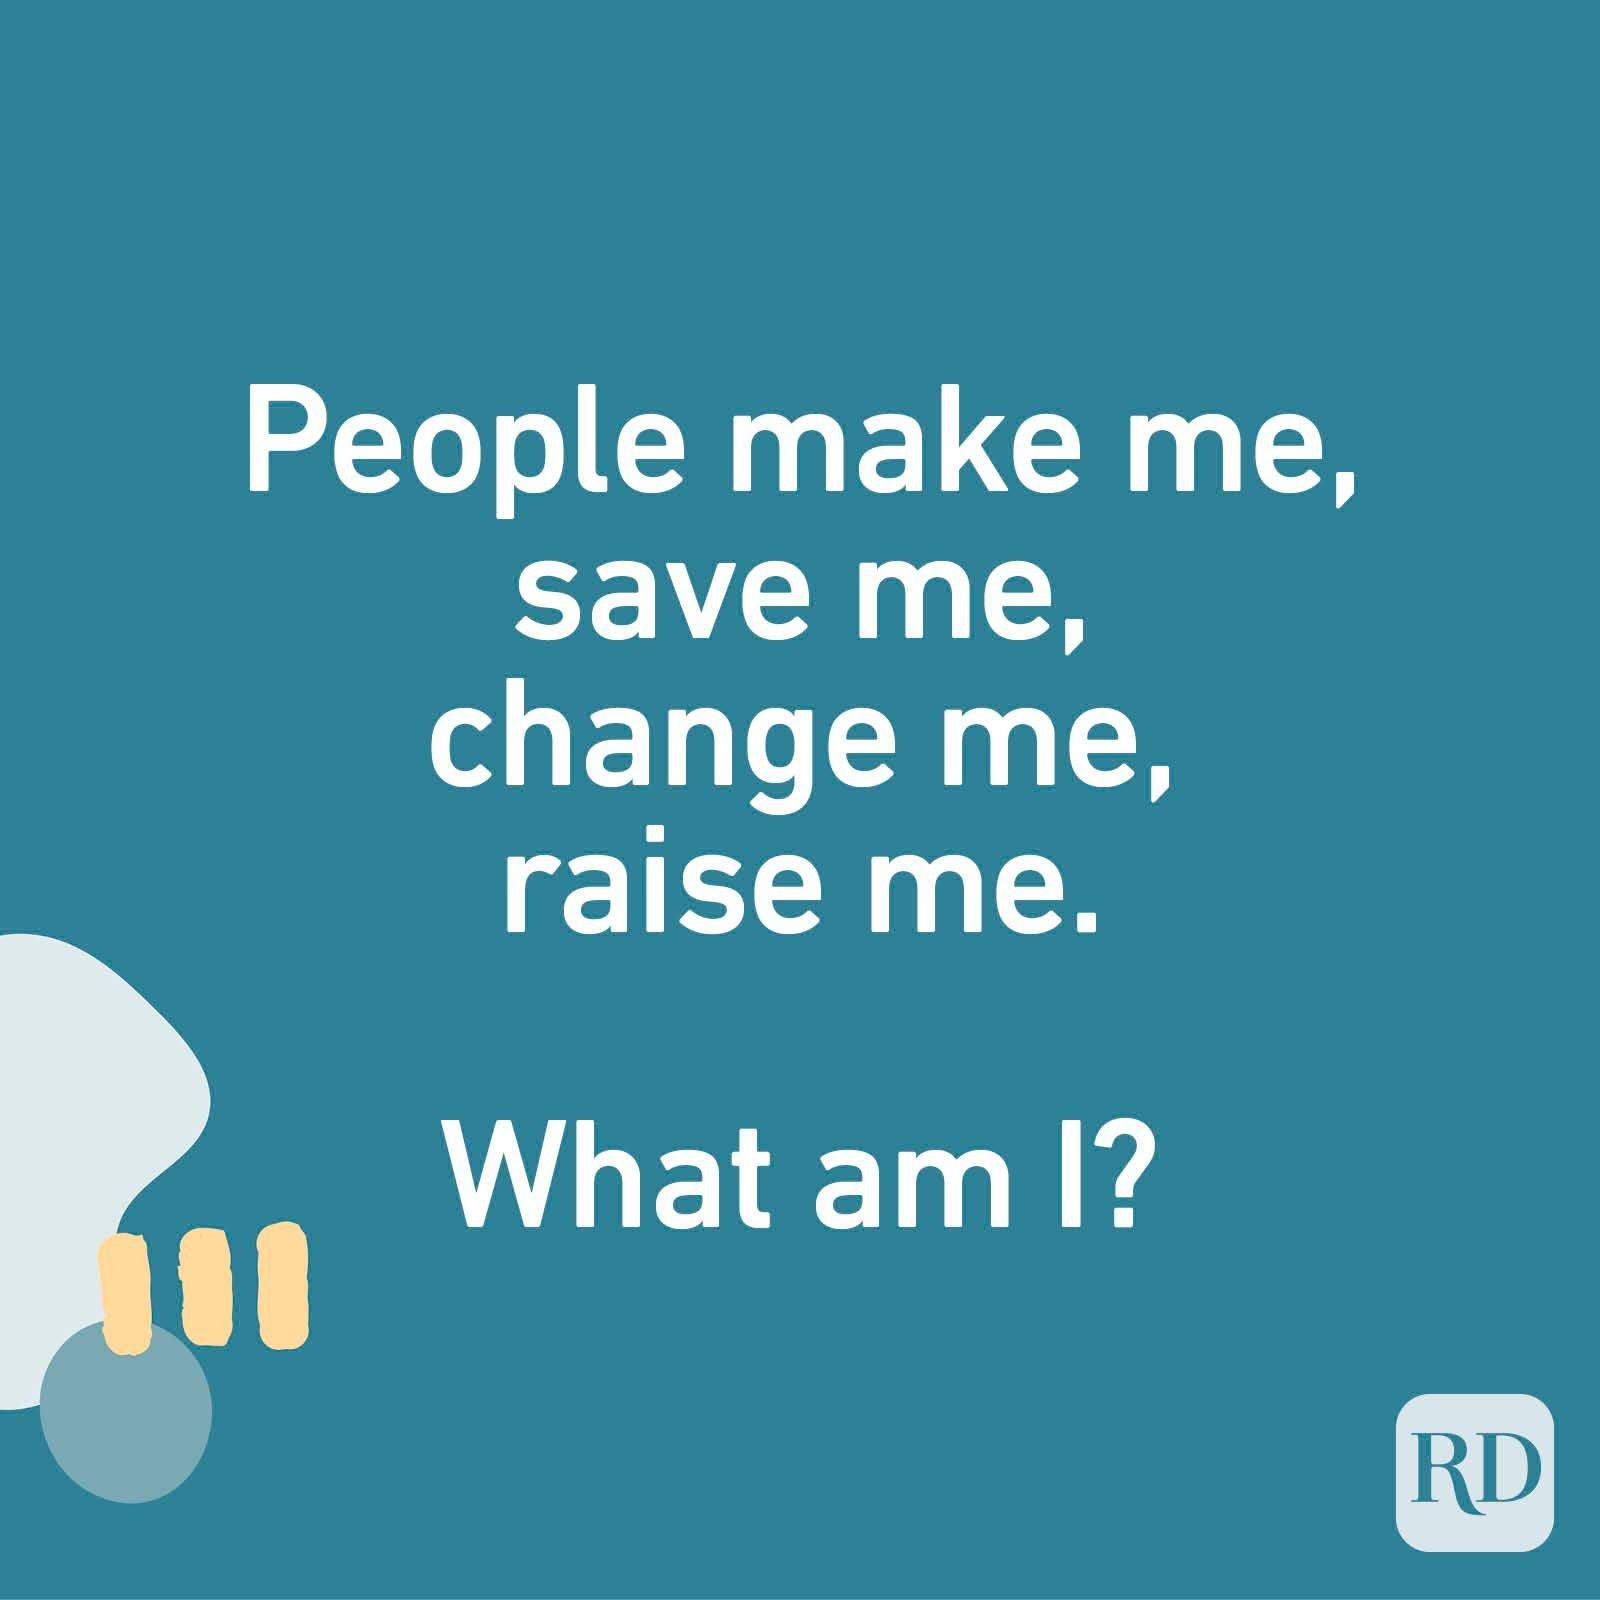 People make me, save me, change me, raise me. What am I?